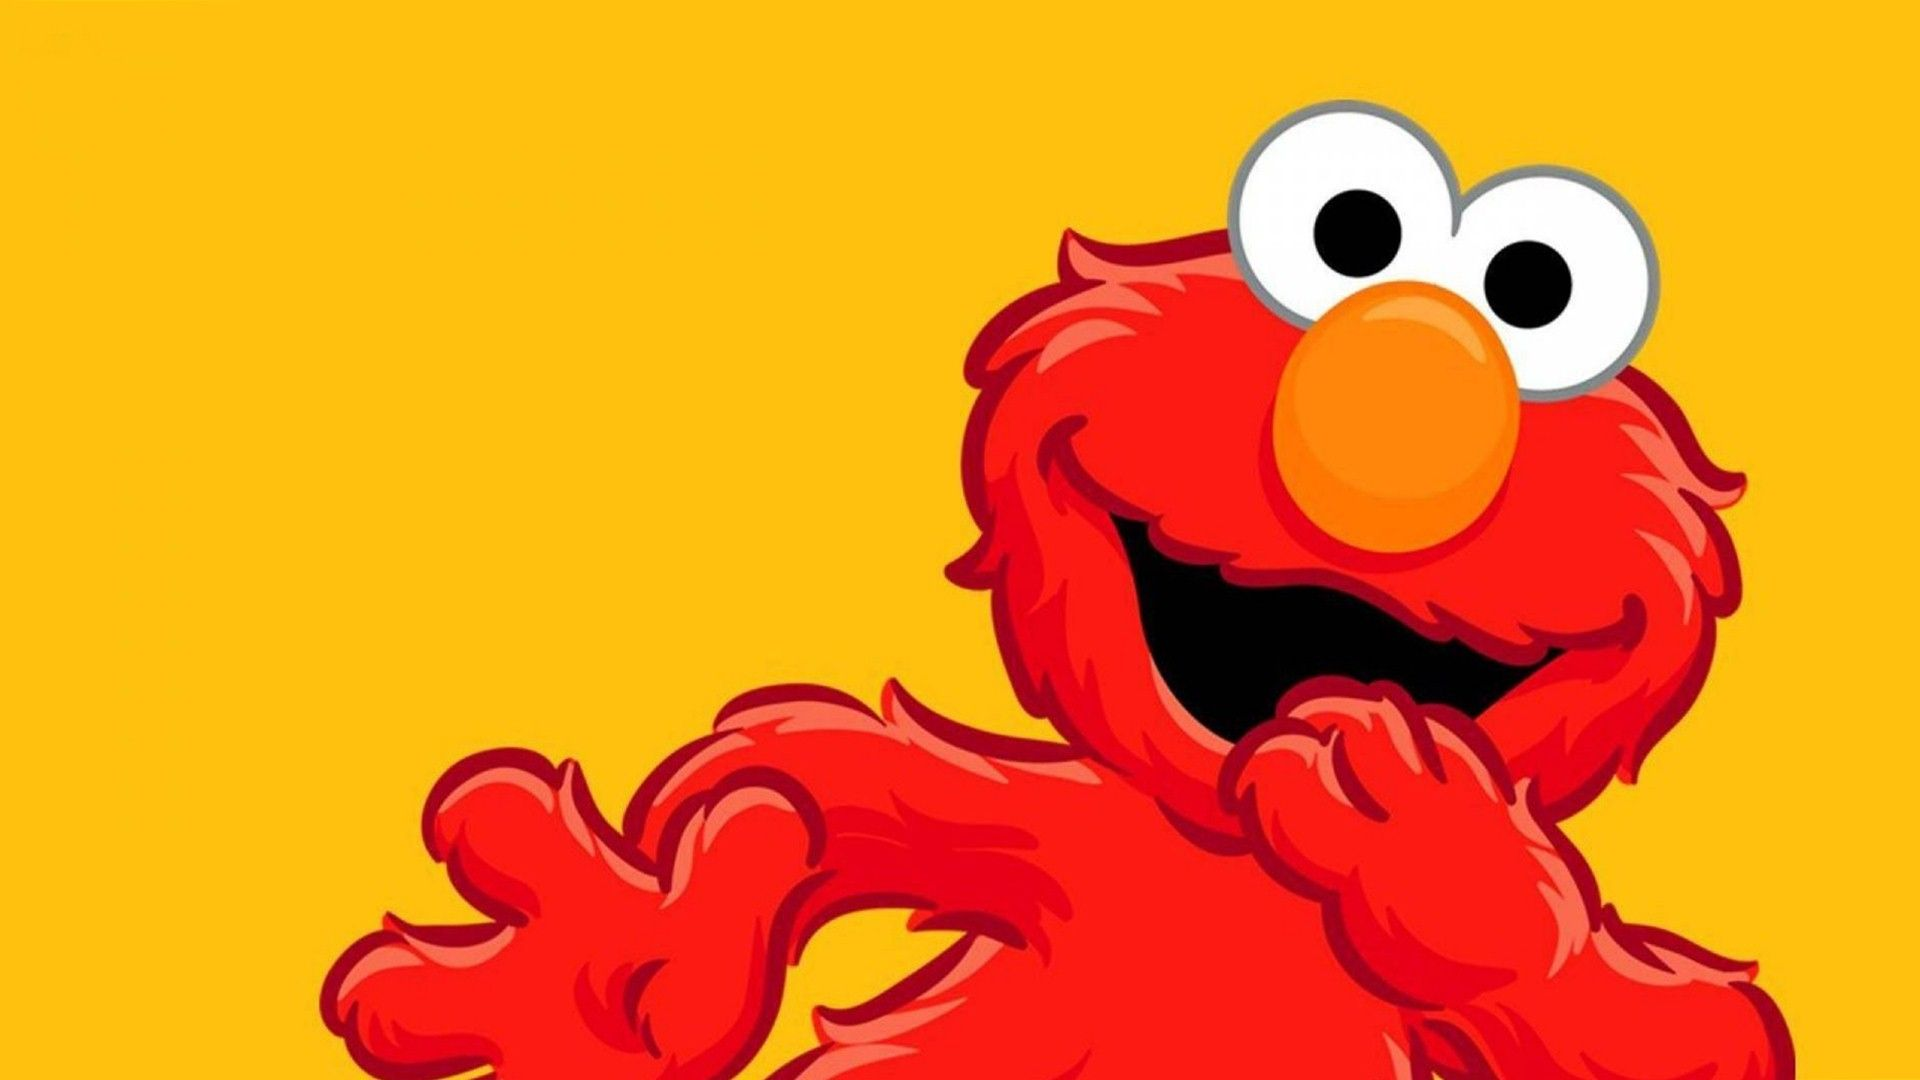 32 Best Hd Elmo Wallpapers Elmo Wallpaper Cookie Monster Wallpaper Elmo